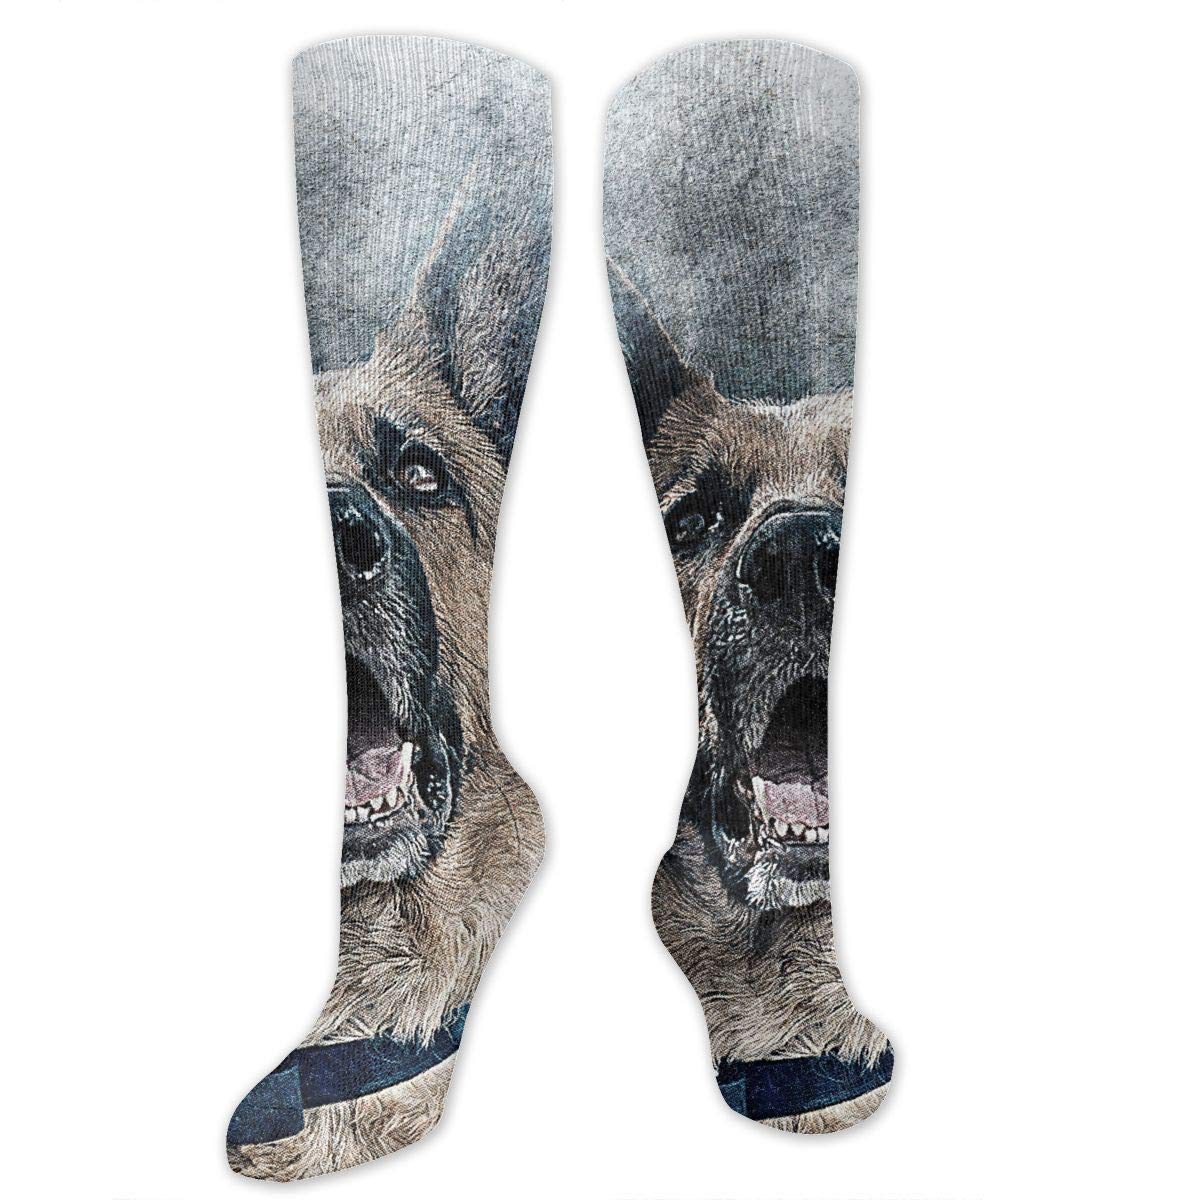 Men Multicolored Pattern Fashionable Fun Crew Cotton Socks Chanwazibibiliu Roaring Dog Cute Mens Colorful Dress Socks Funky